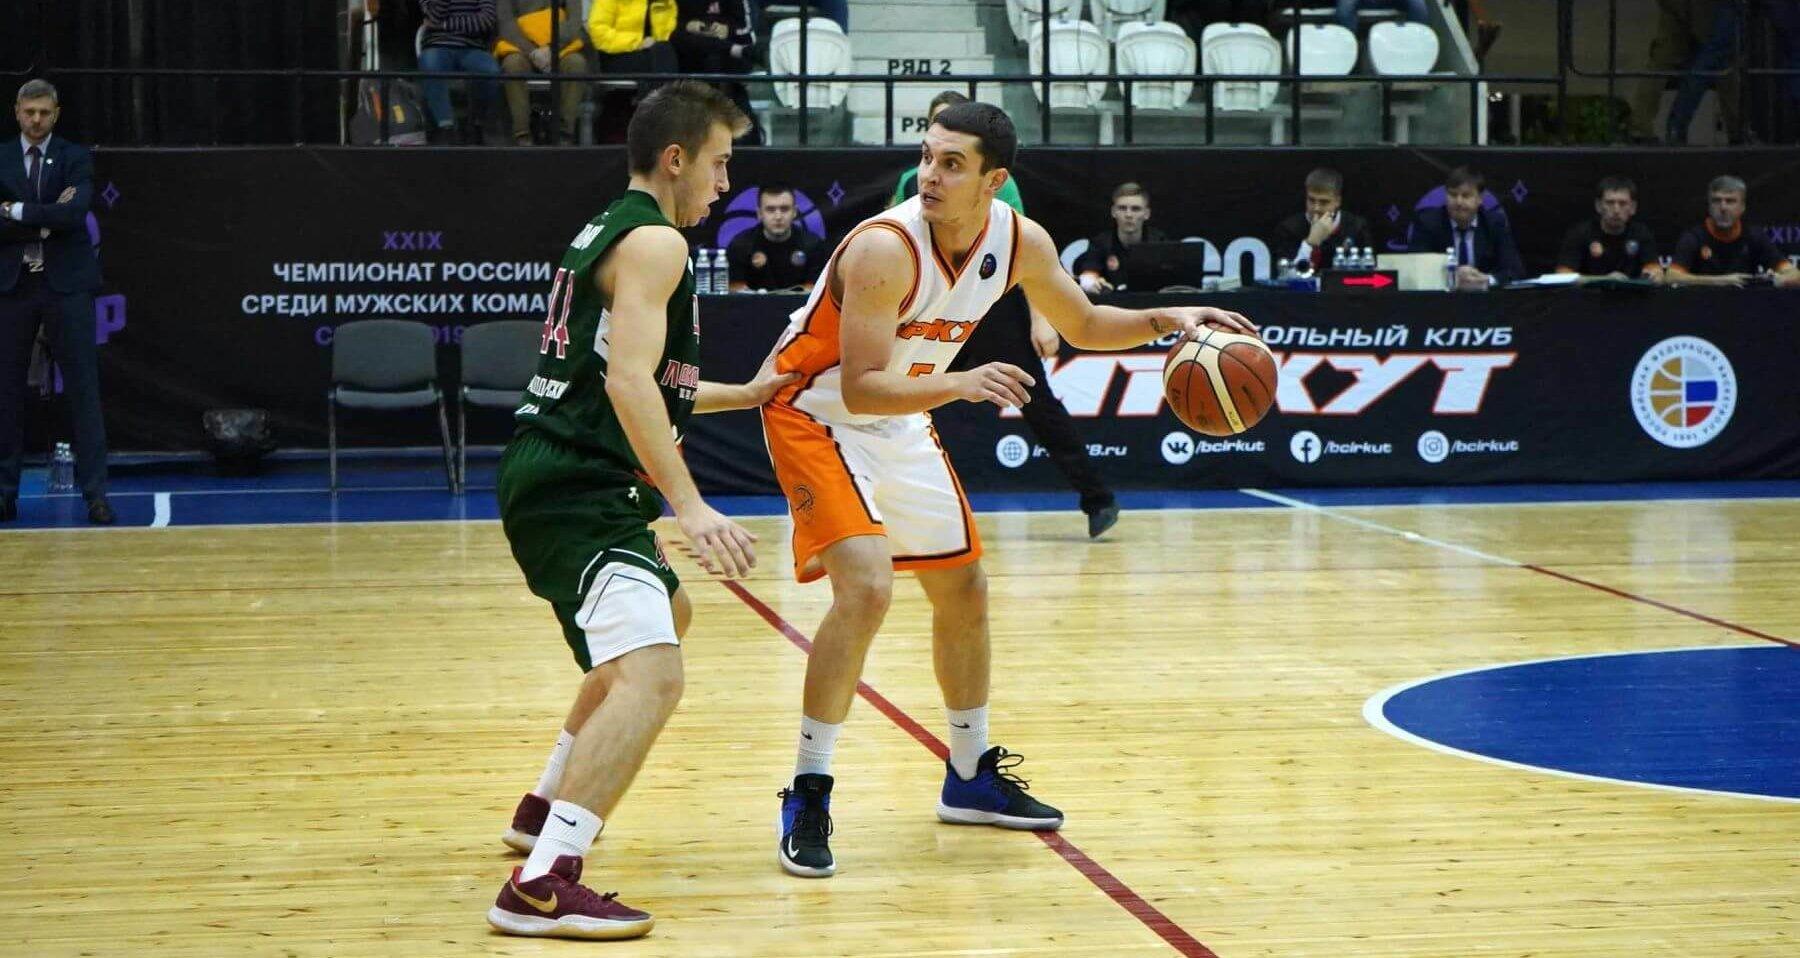 Баскетбол Иркут Краснодар